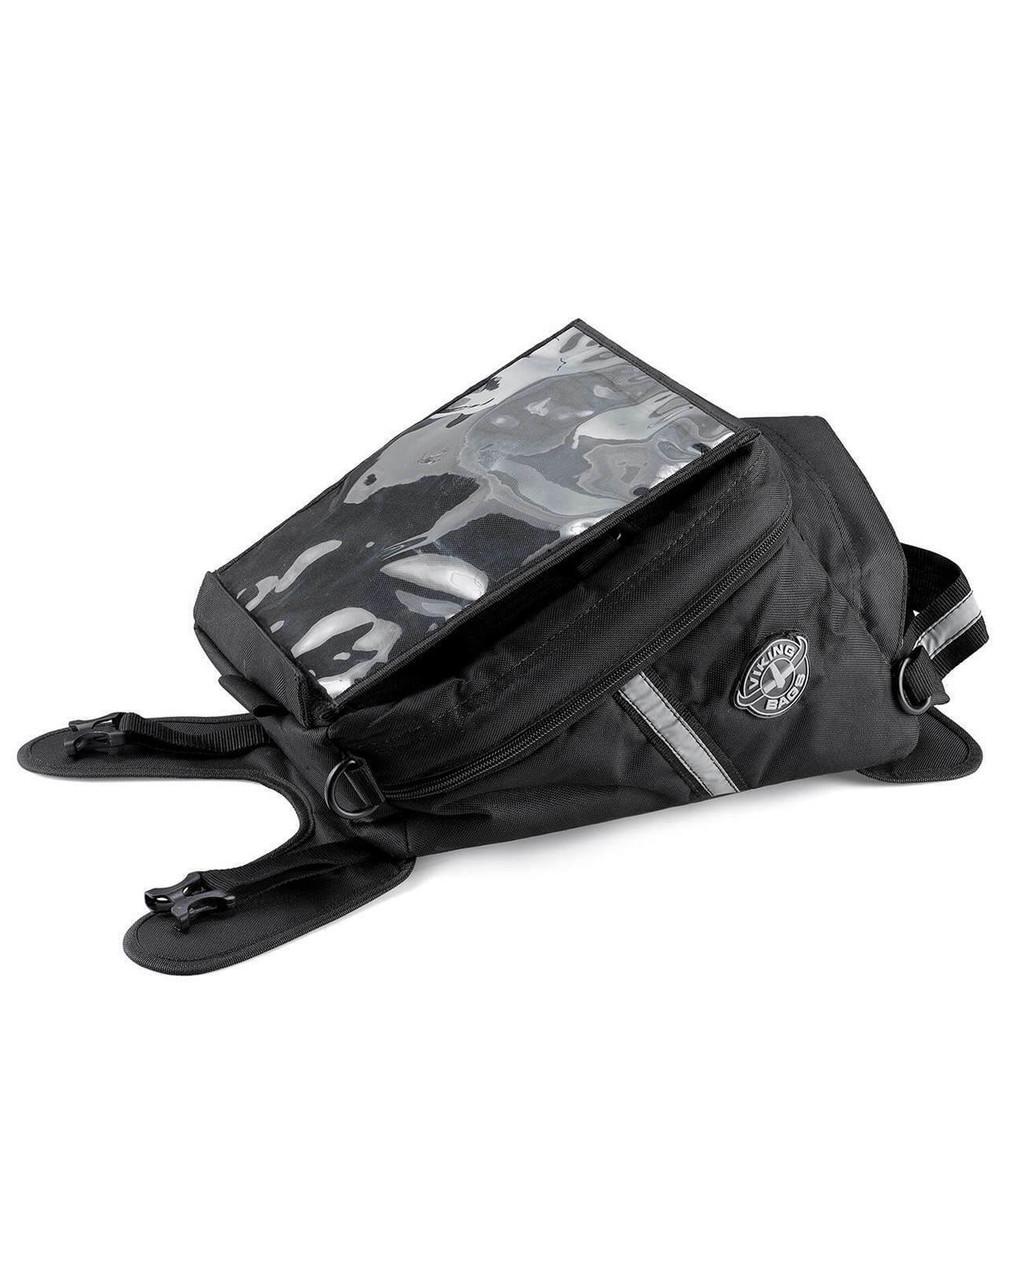 Viking Dirtman Small Black Motorcycle Tank Bag For Harley Davidson Main Bag View